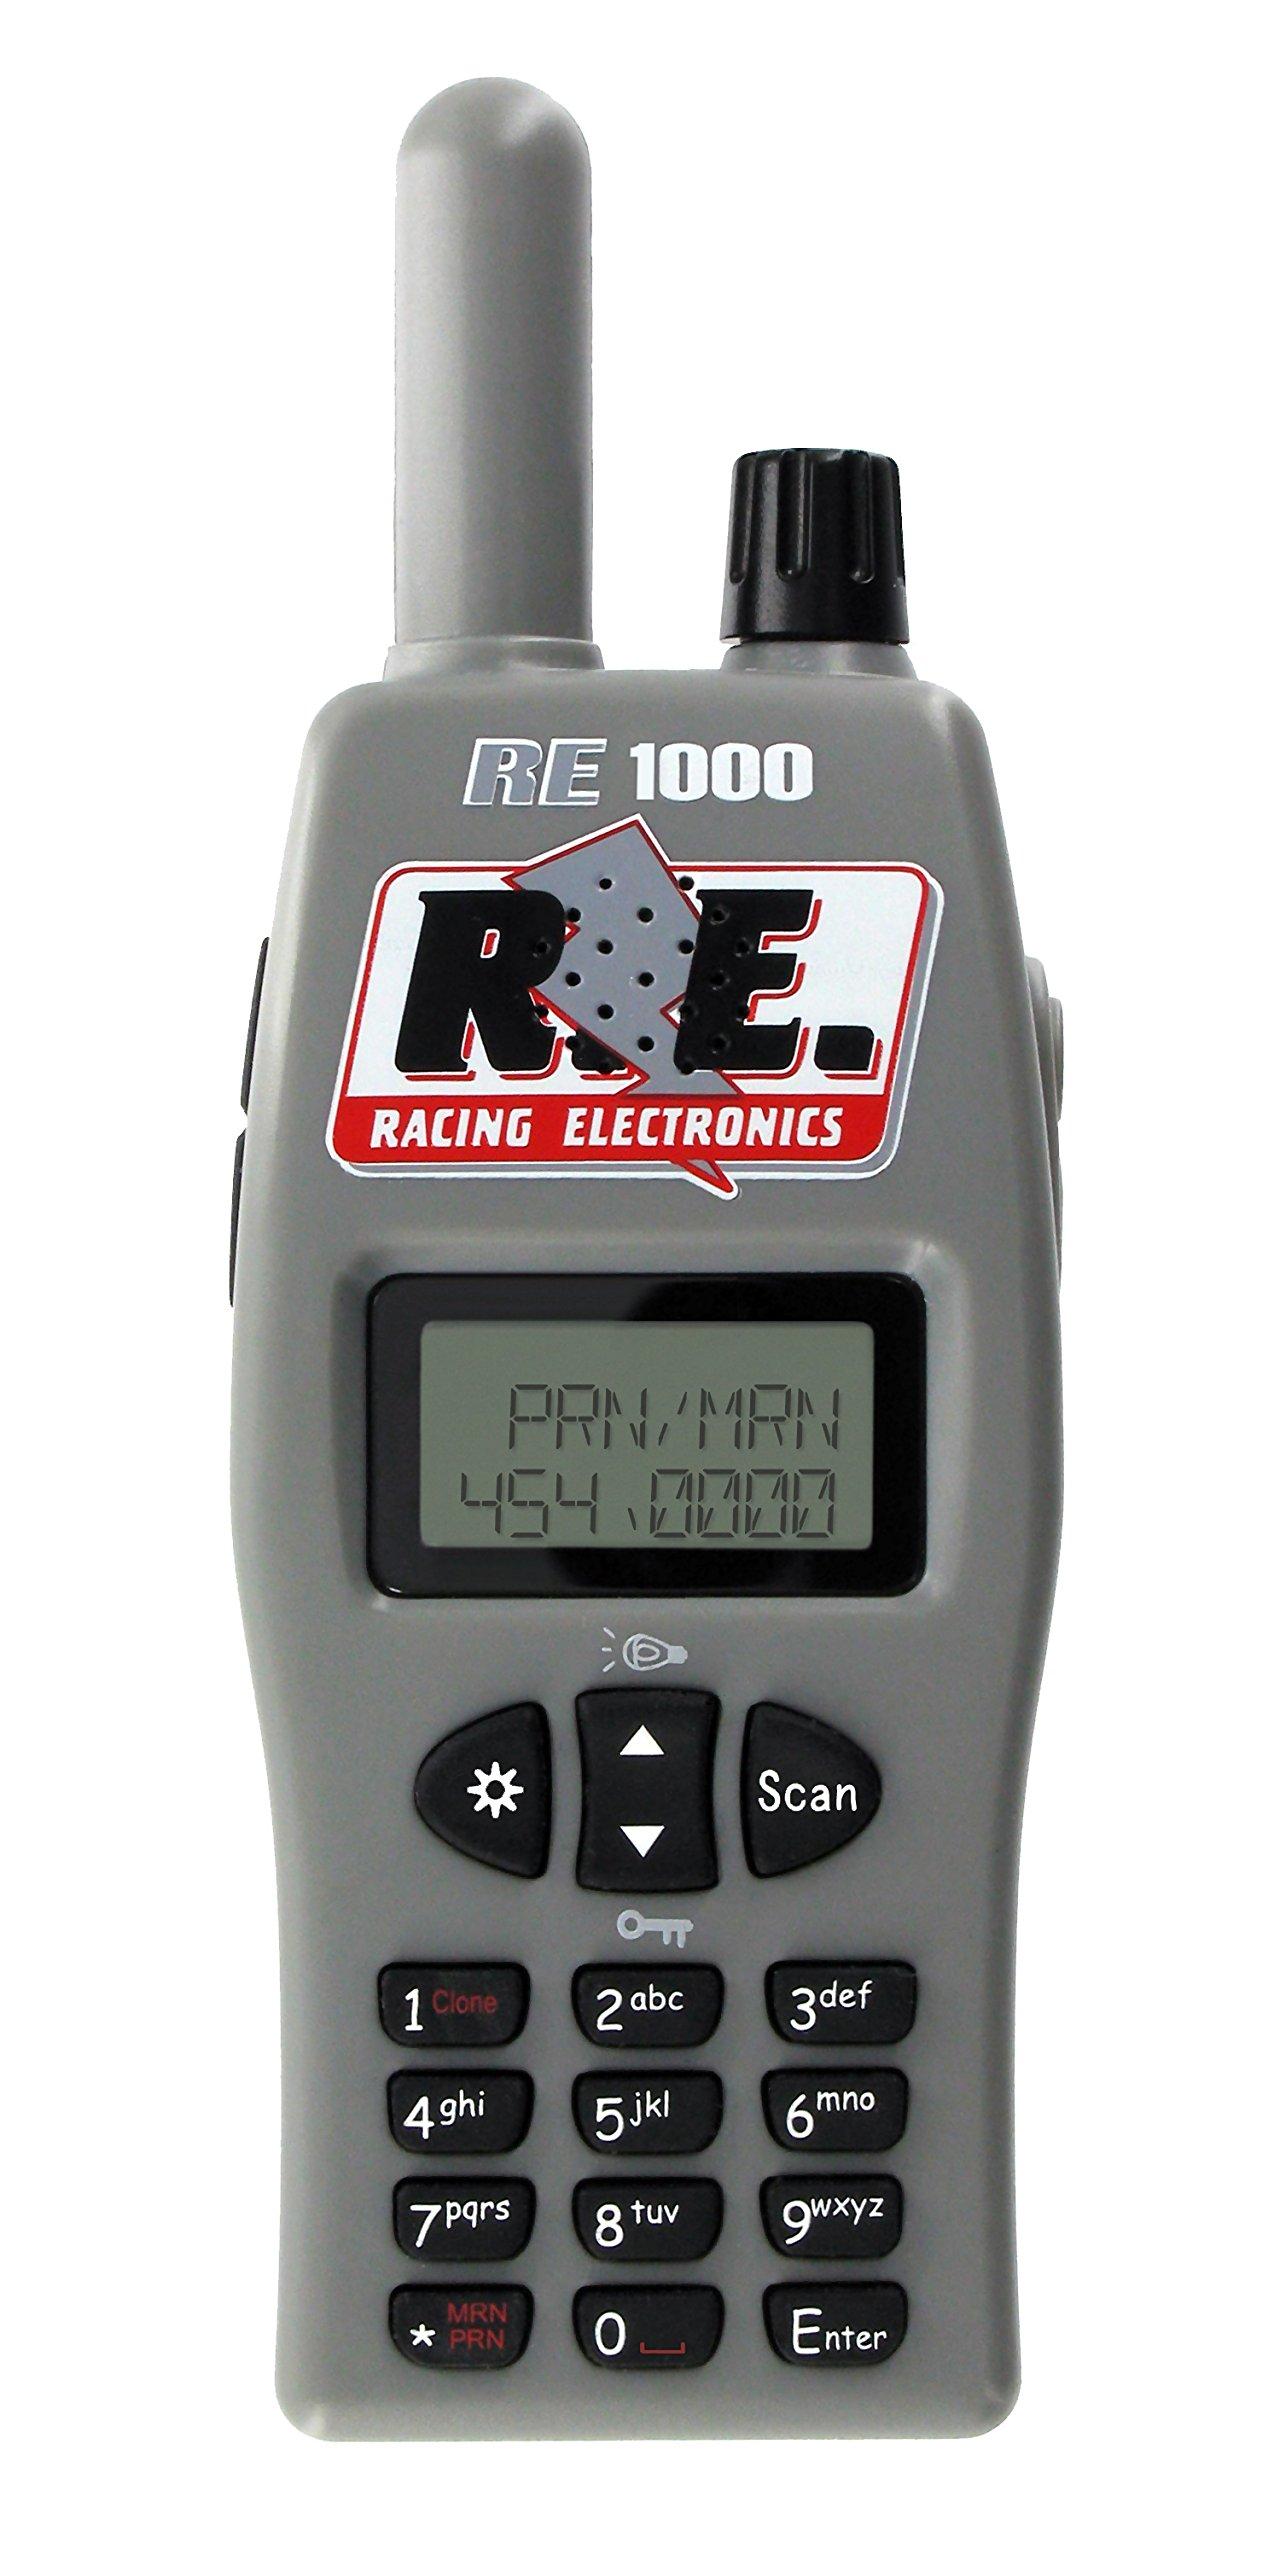 RE1000 RACING SCANNER by Racing Electronics (Image #1)